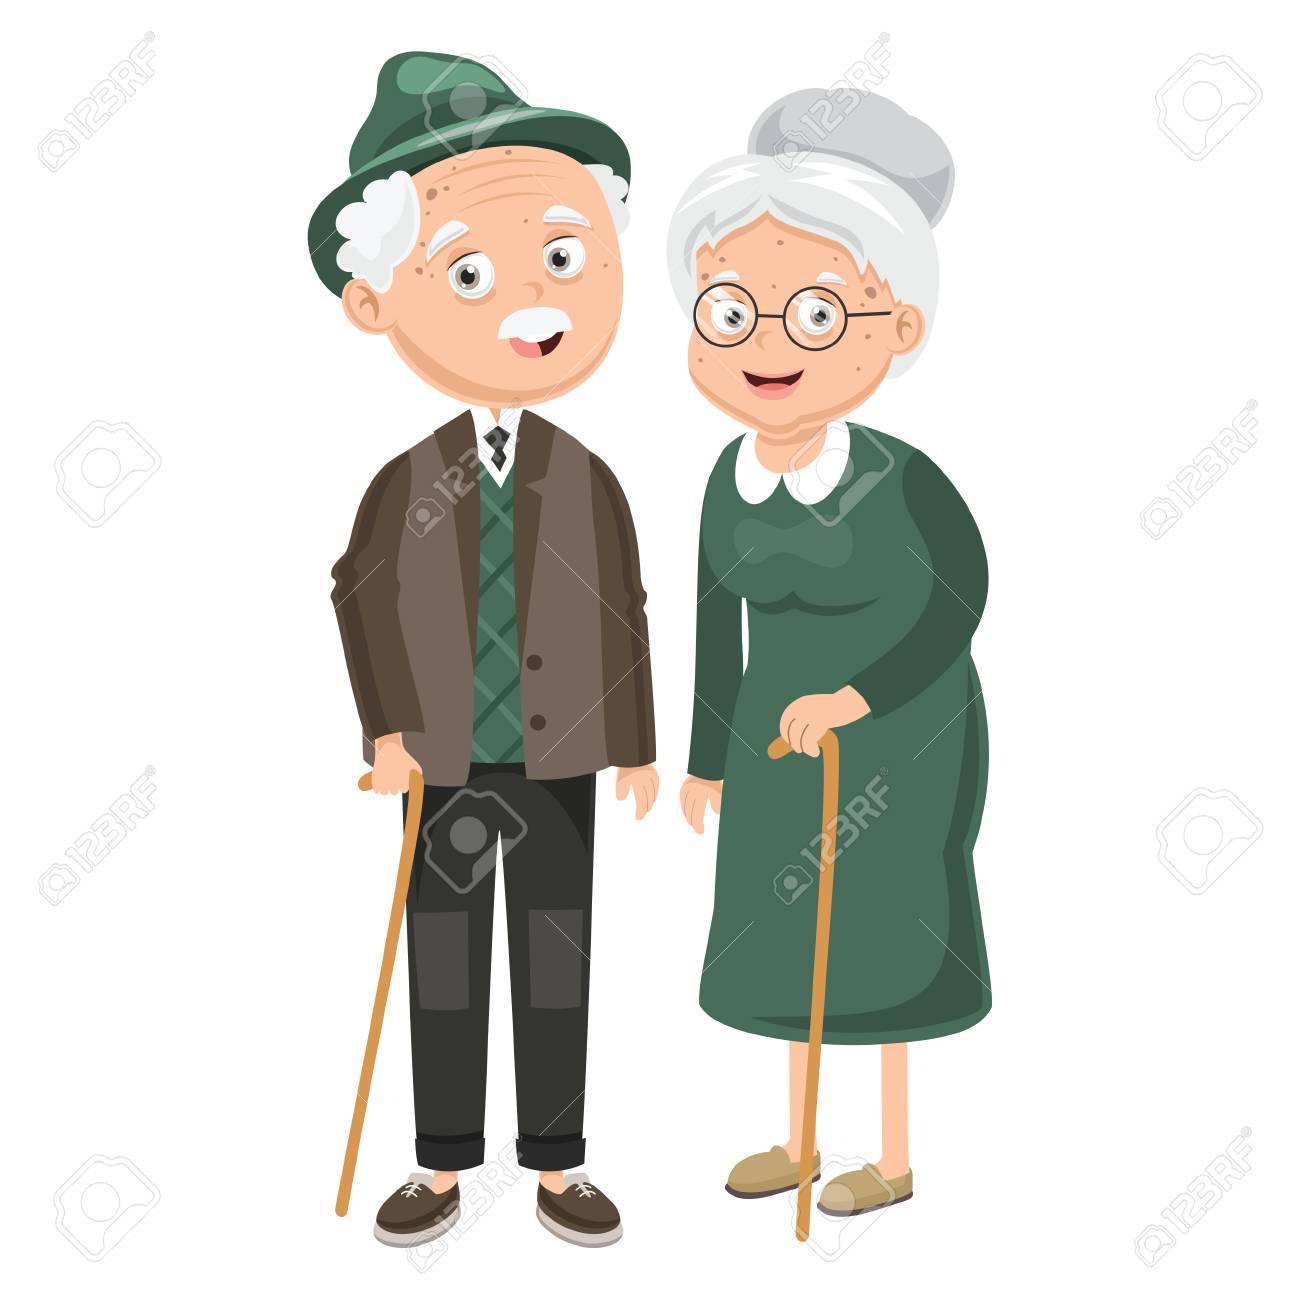 Vector Illustration Of Grandparents - 101047738